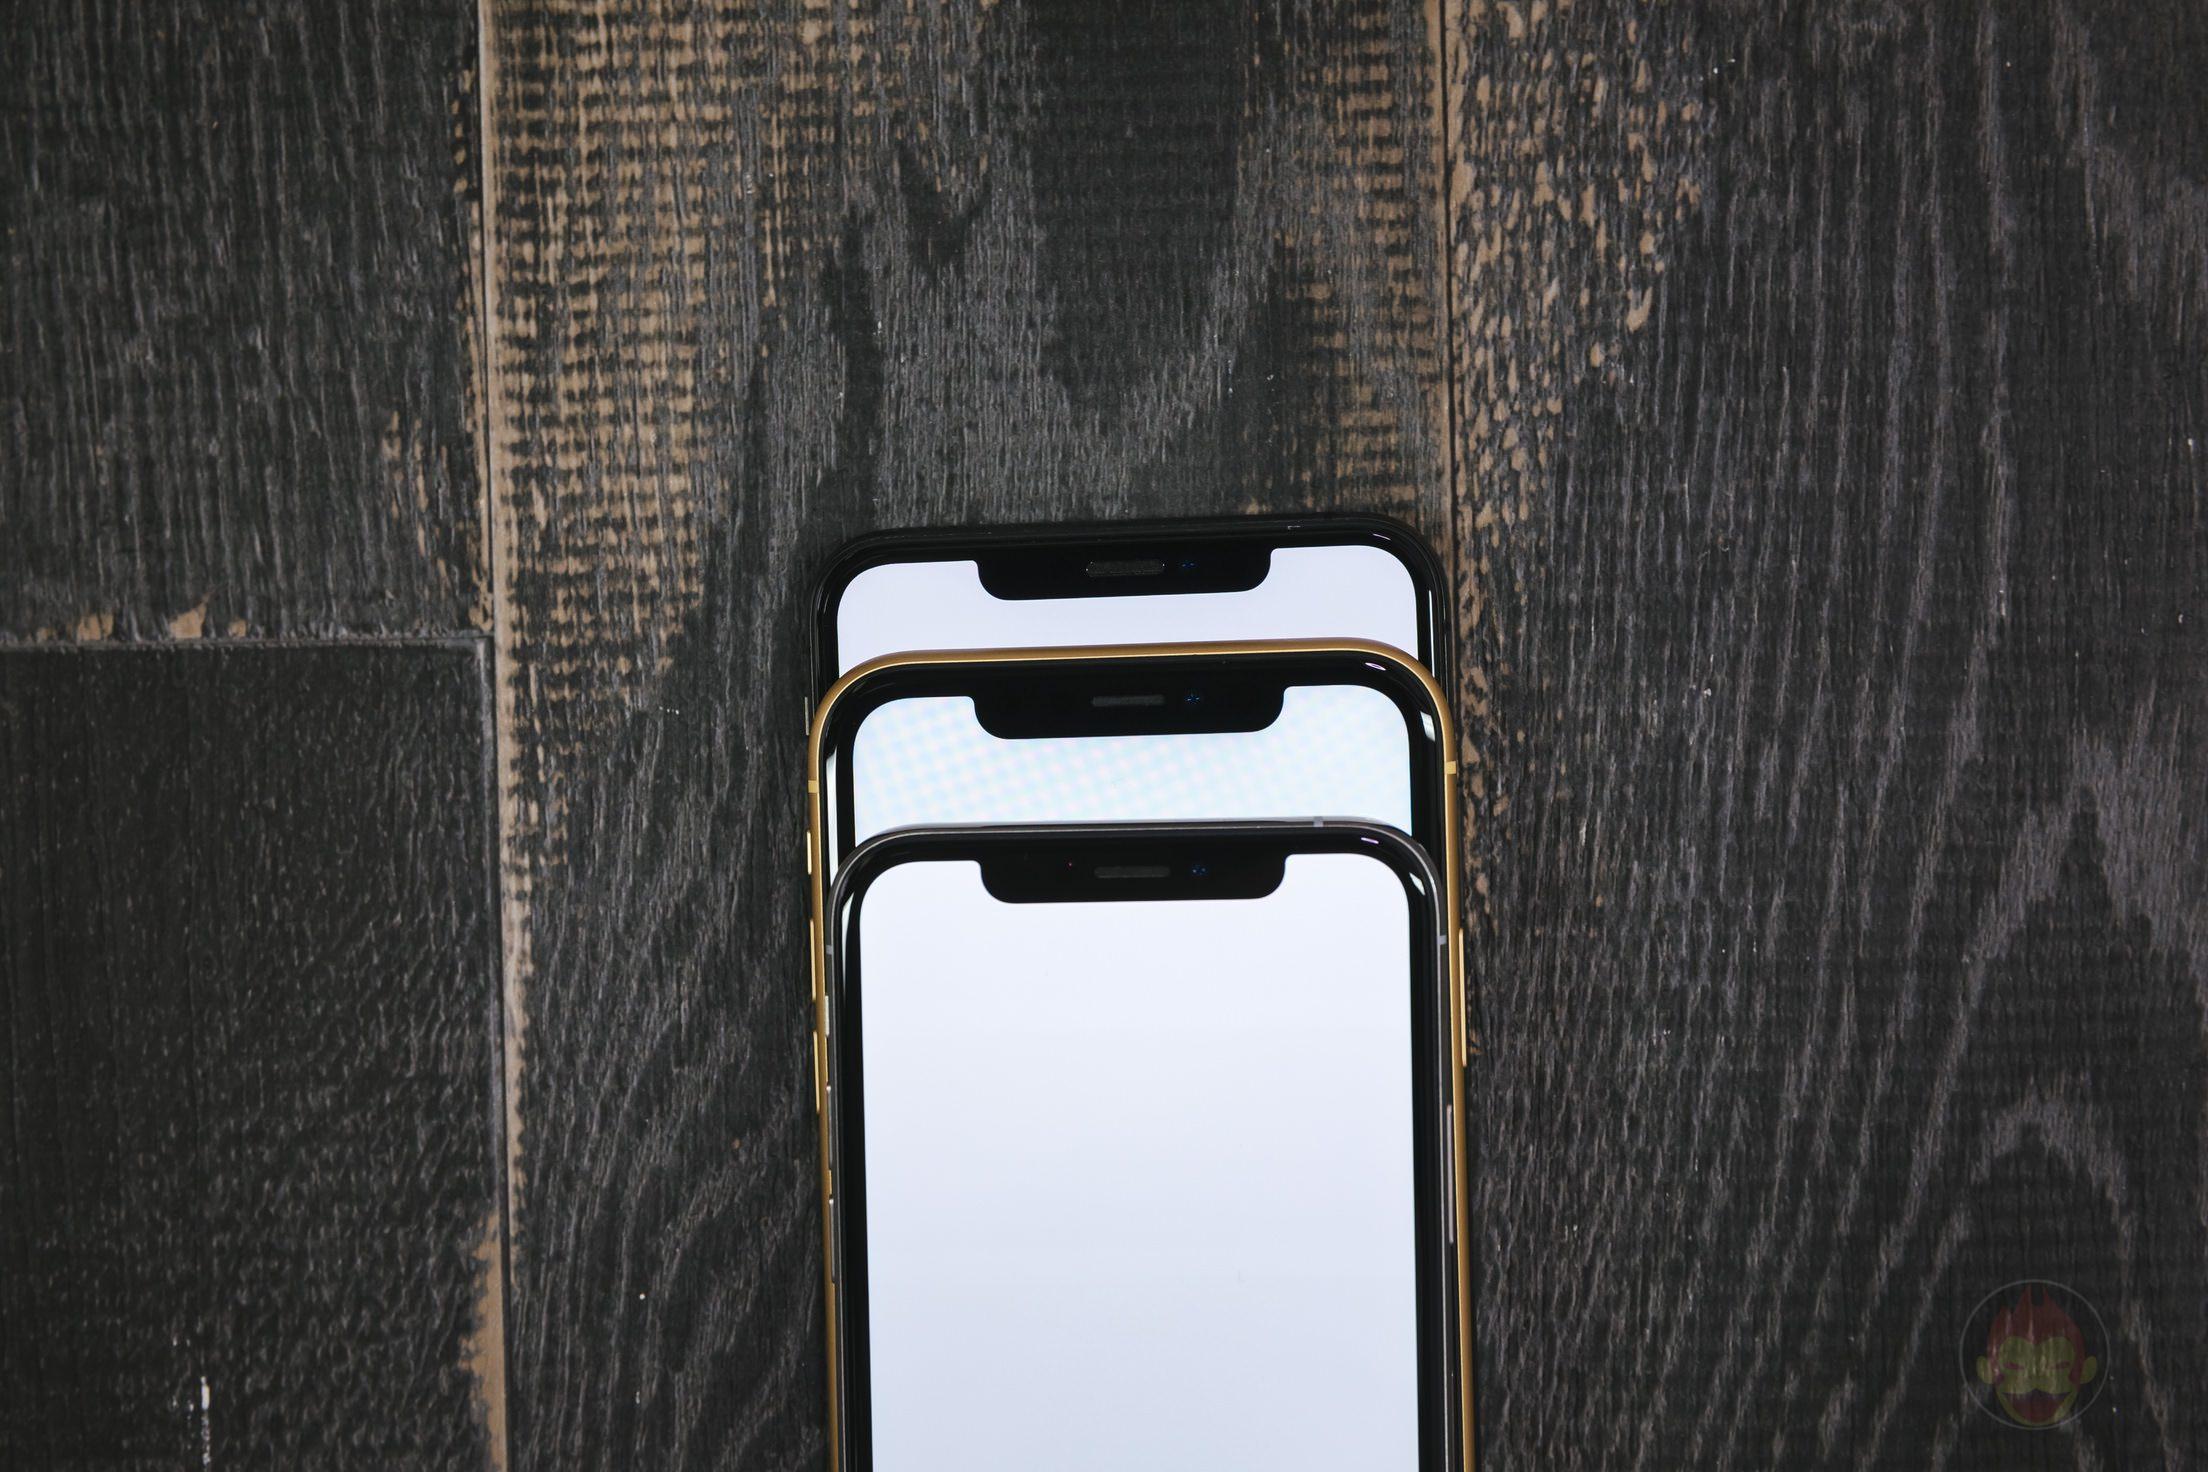 iPhone-XR-Review-239.jpg